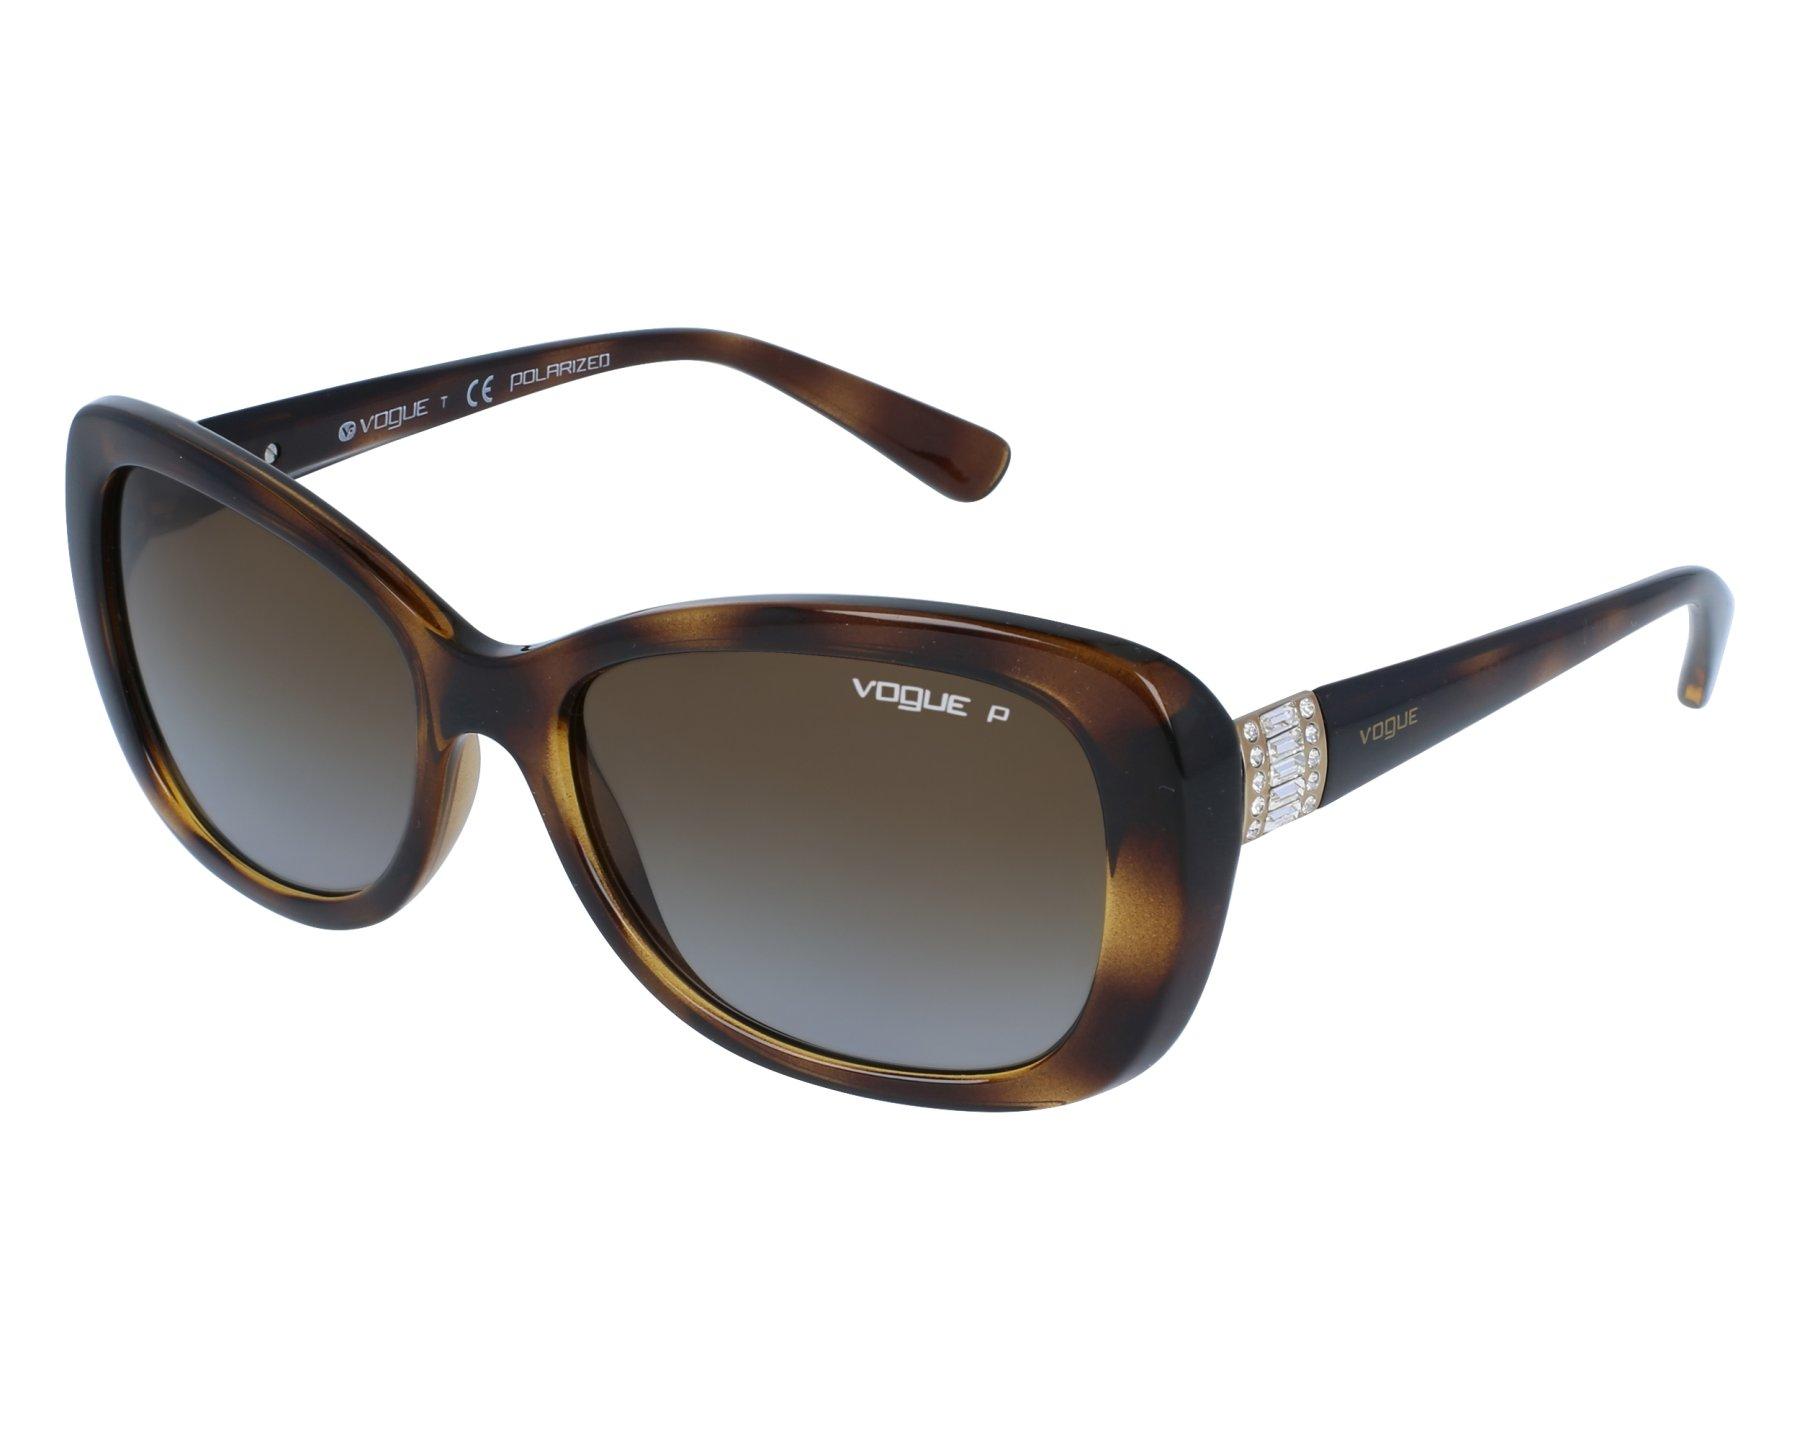 Vogue Vo2943sb W656t5 55-17 7OLE7